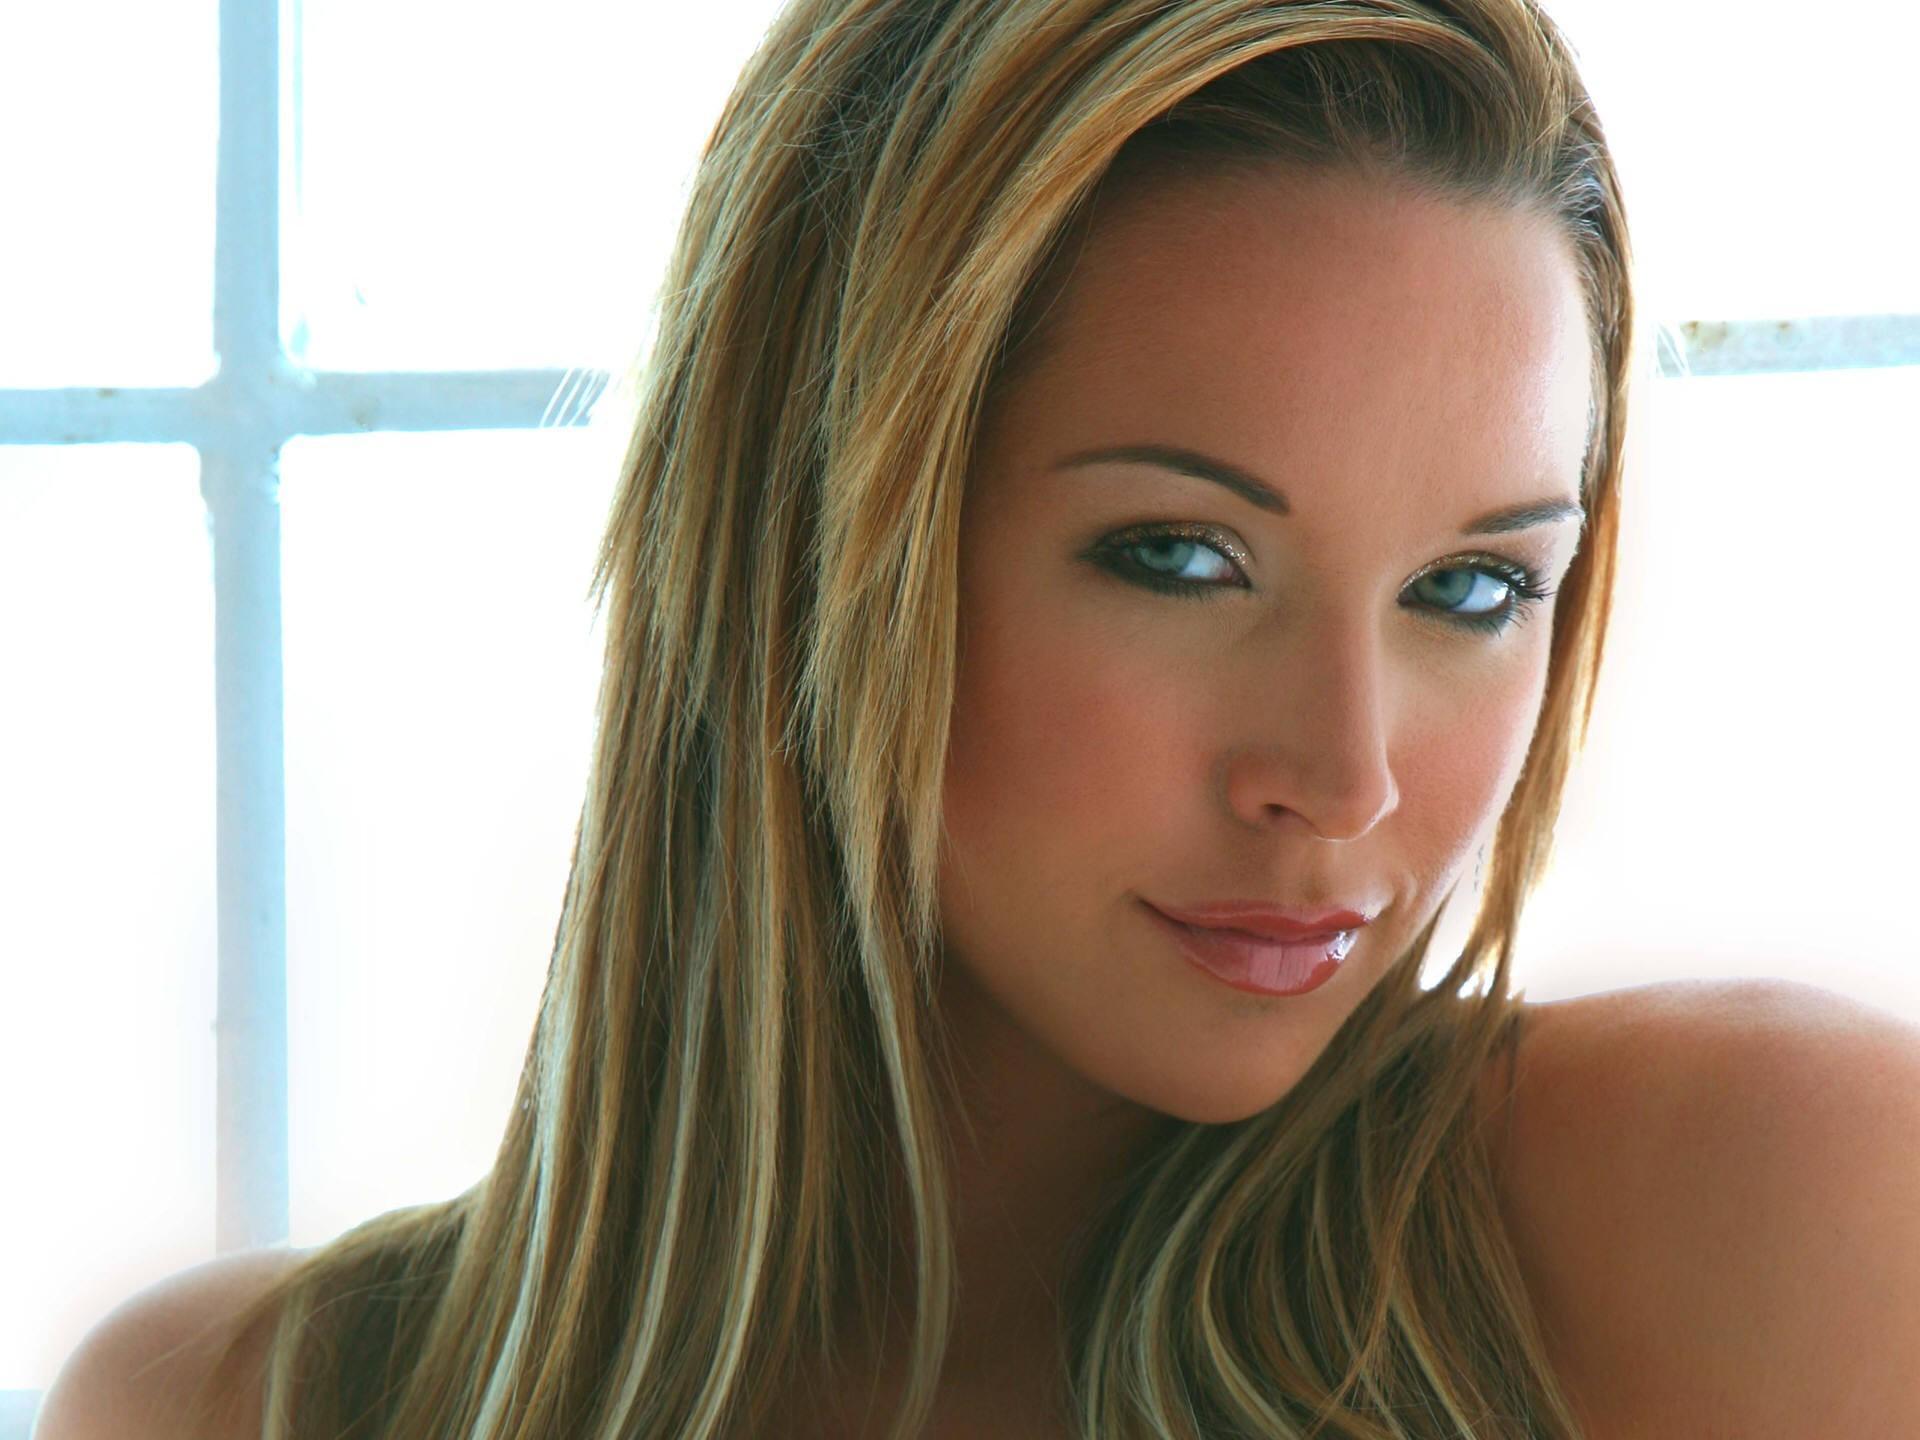 women blonde face model pornstar emily scott